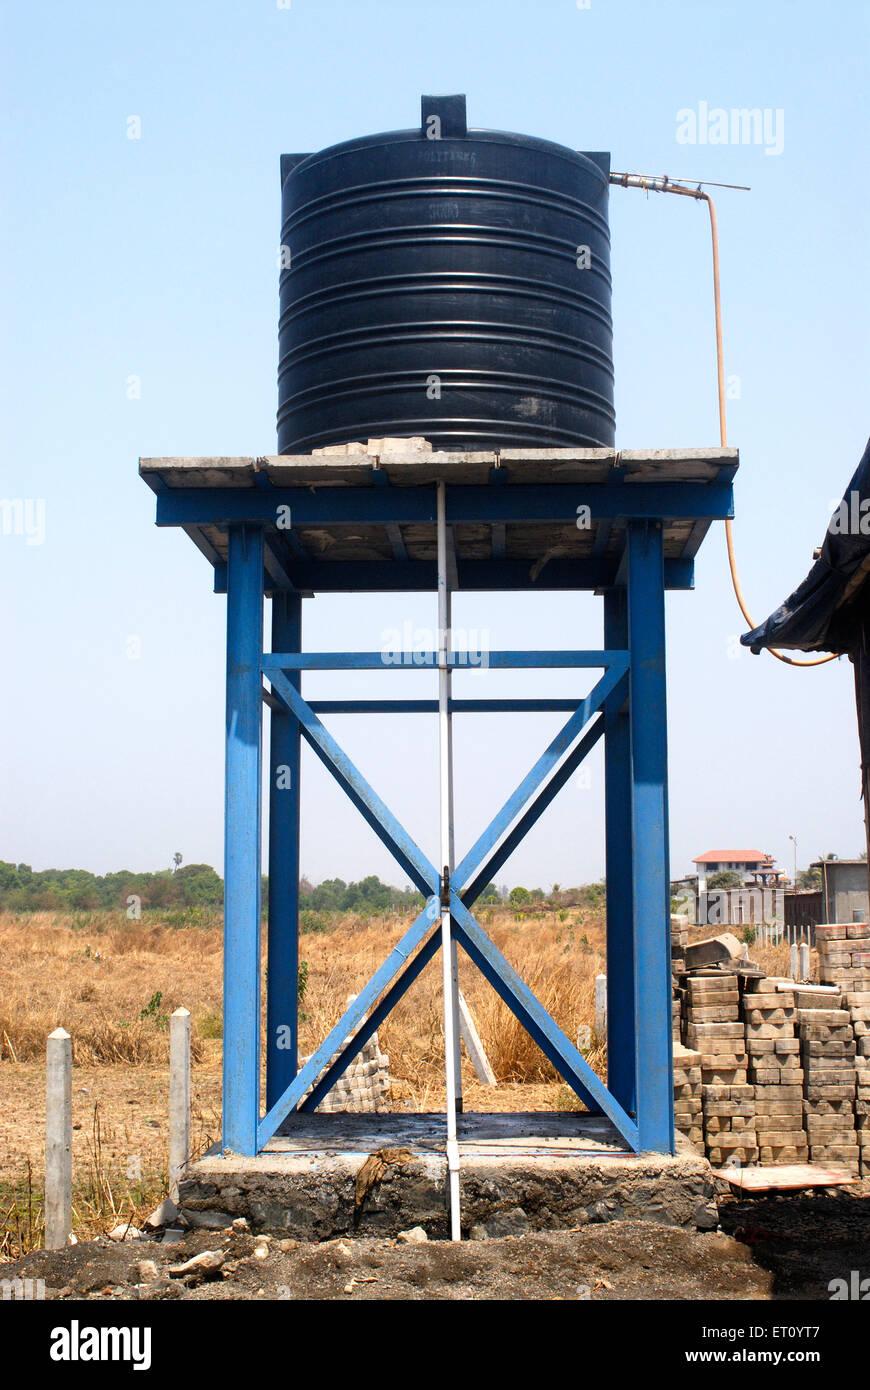 Circular Poly Plastic Elevated Water Storage Tank At